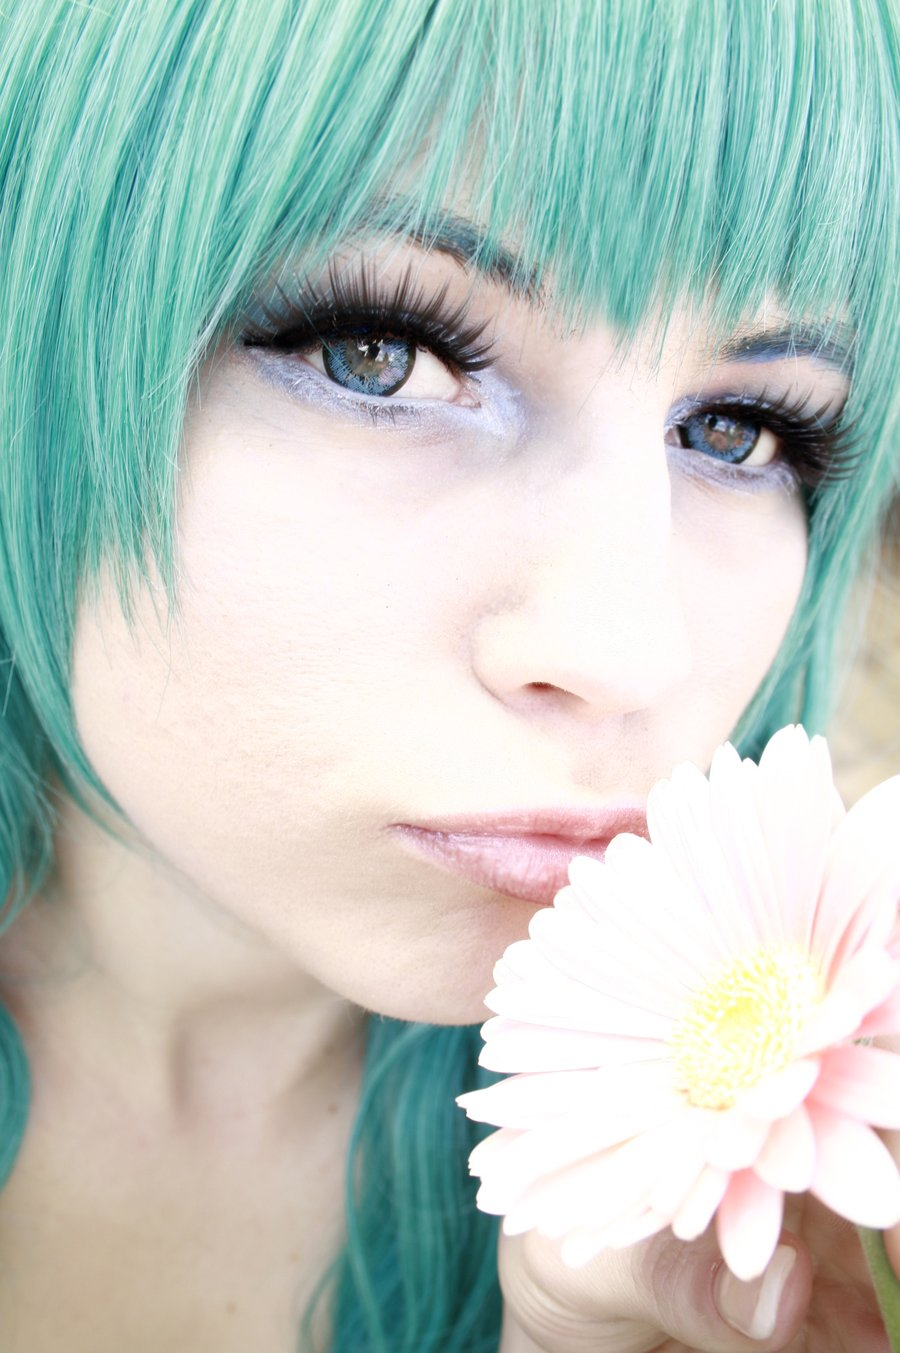 miku hatsune makeup